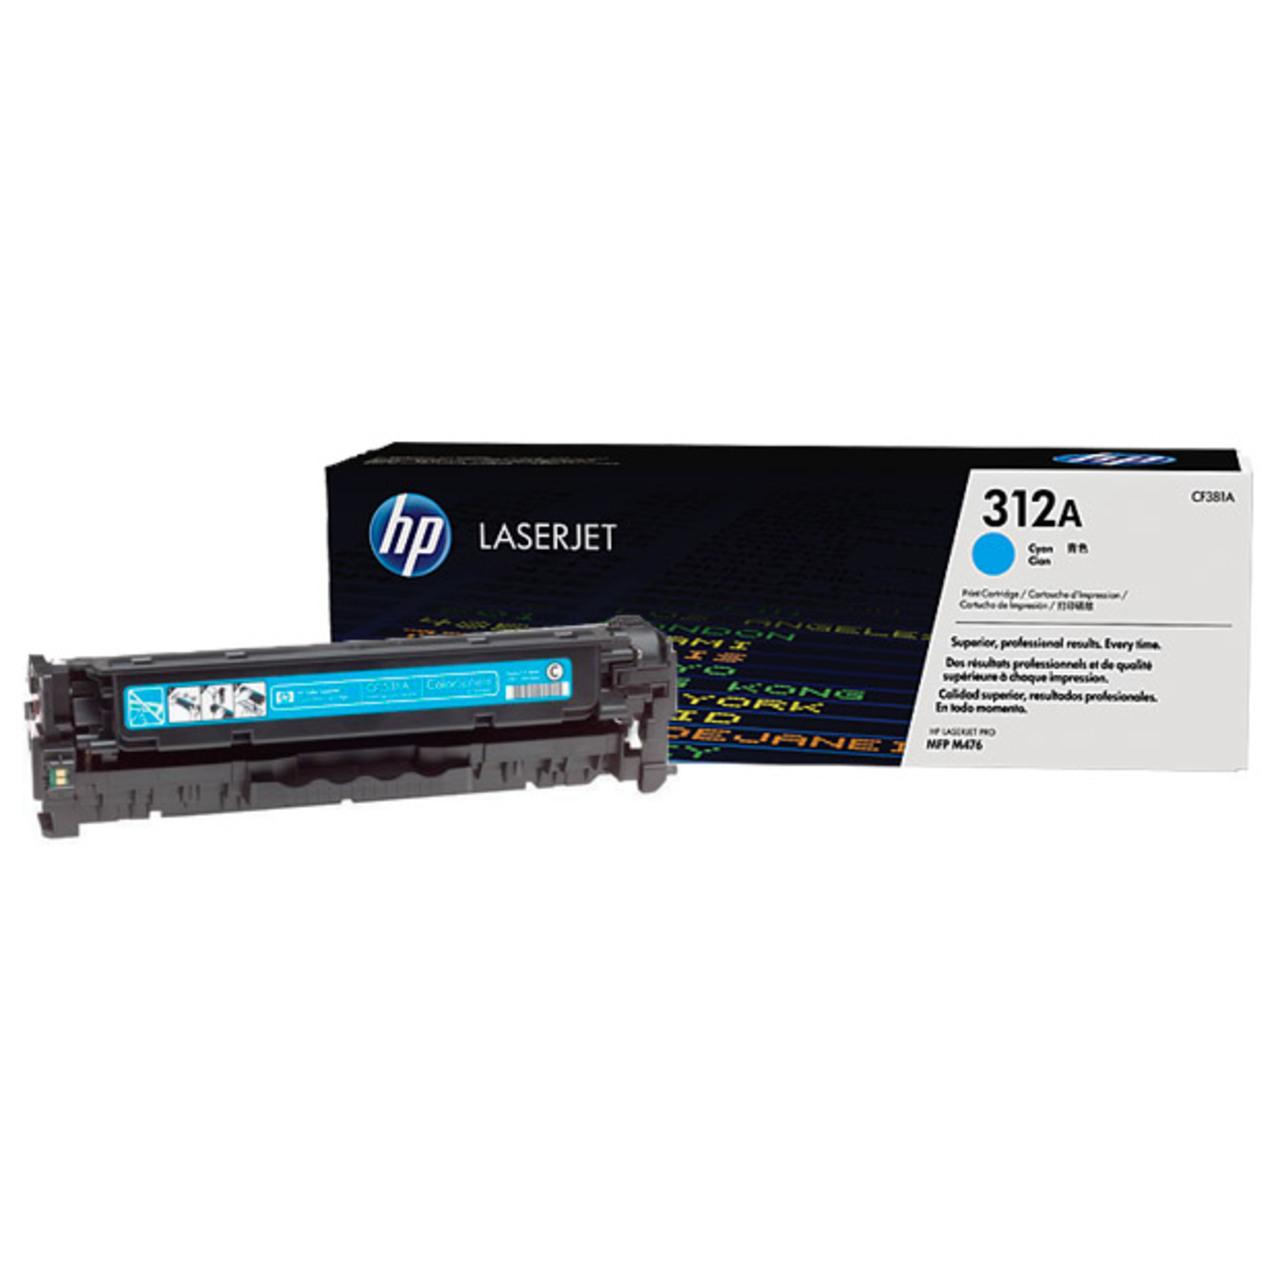 Заправка картриджа CF381A для HP Color LaserJet Pro M476